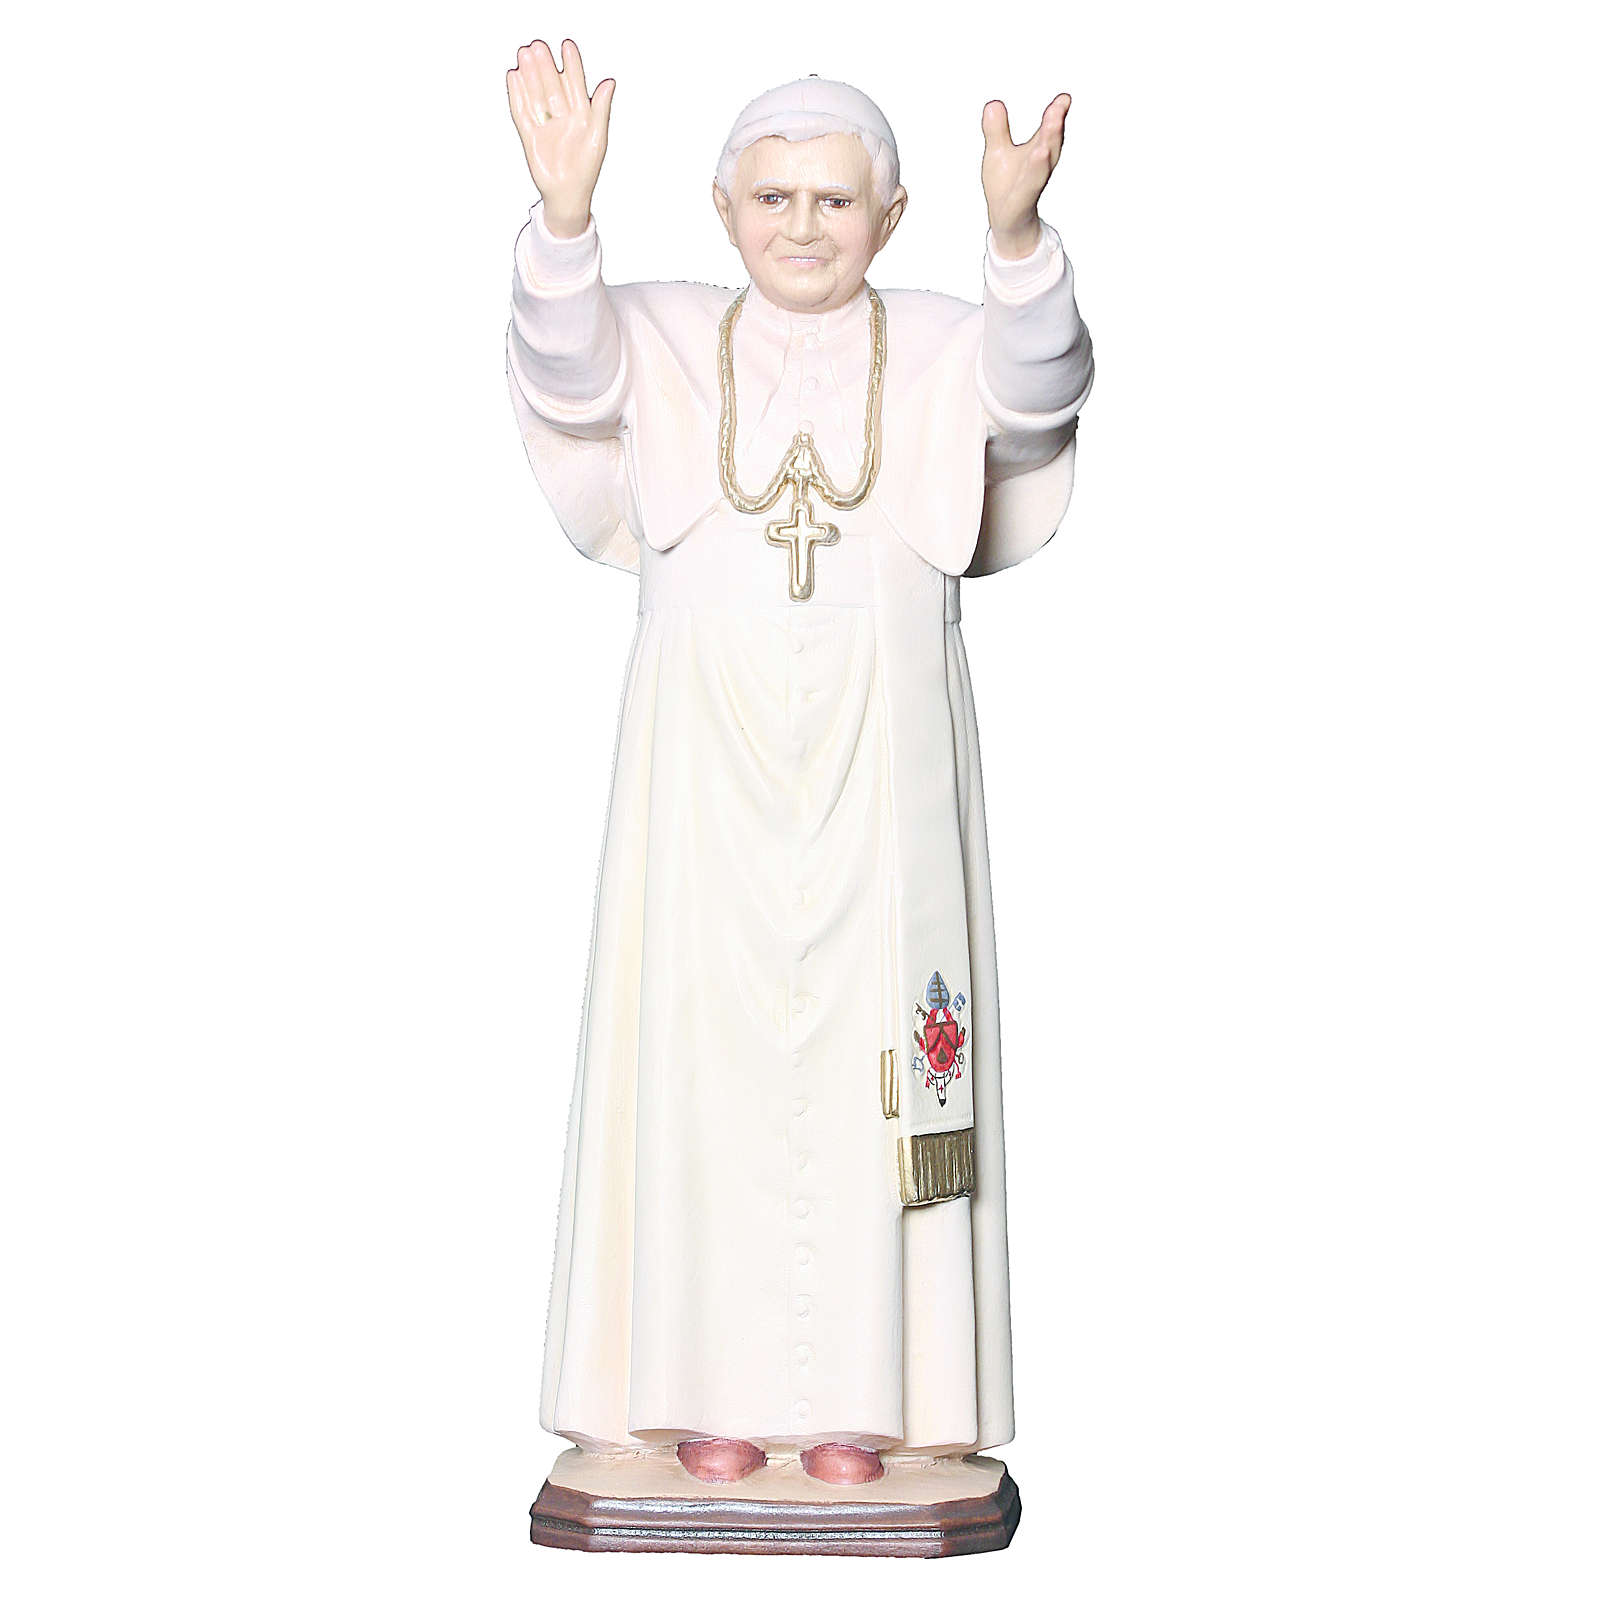 Estatua Papa Benedicto XVI madera pintada cruz dorada blanca 4